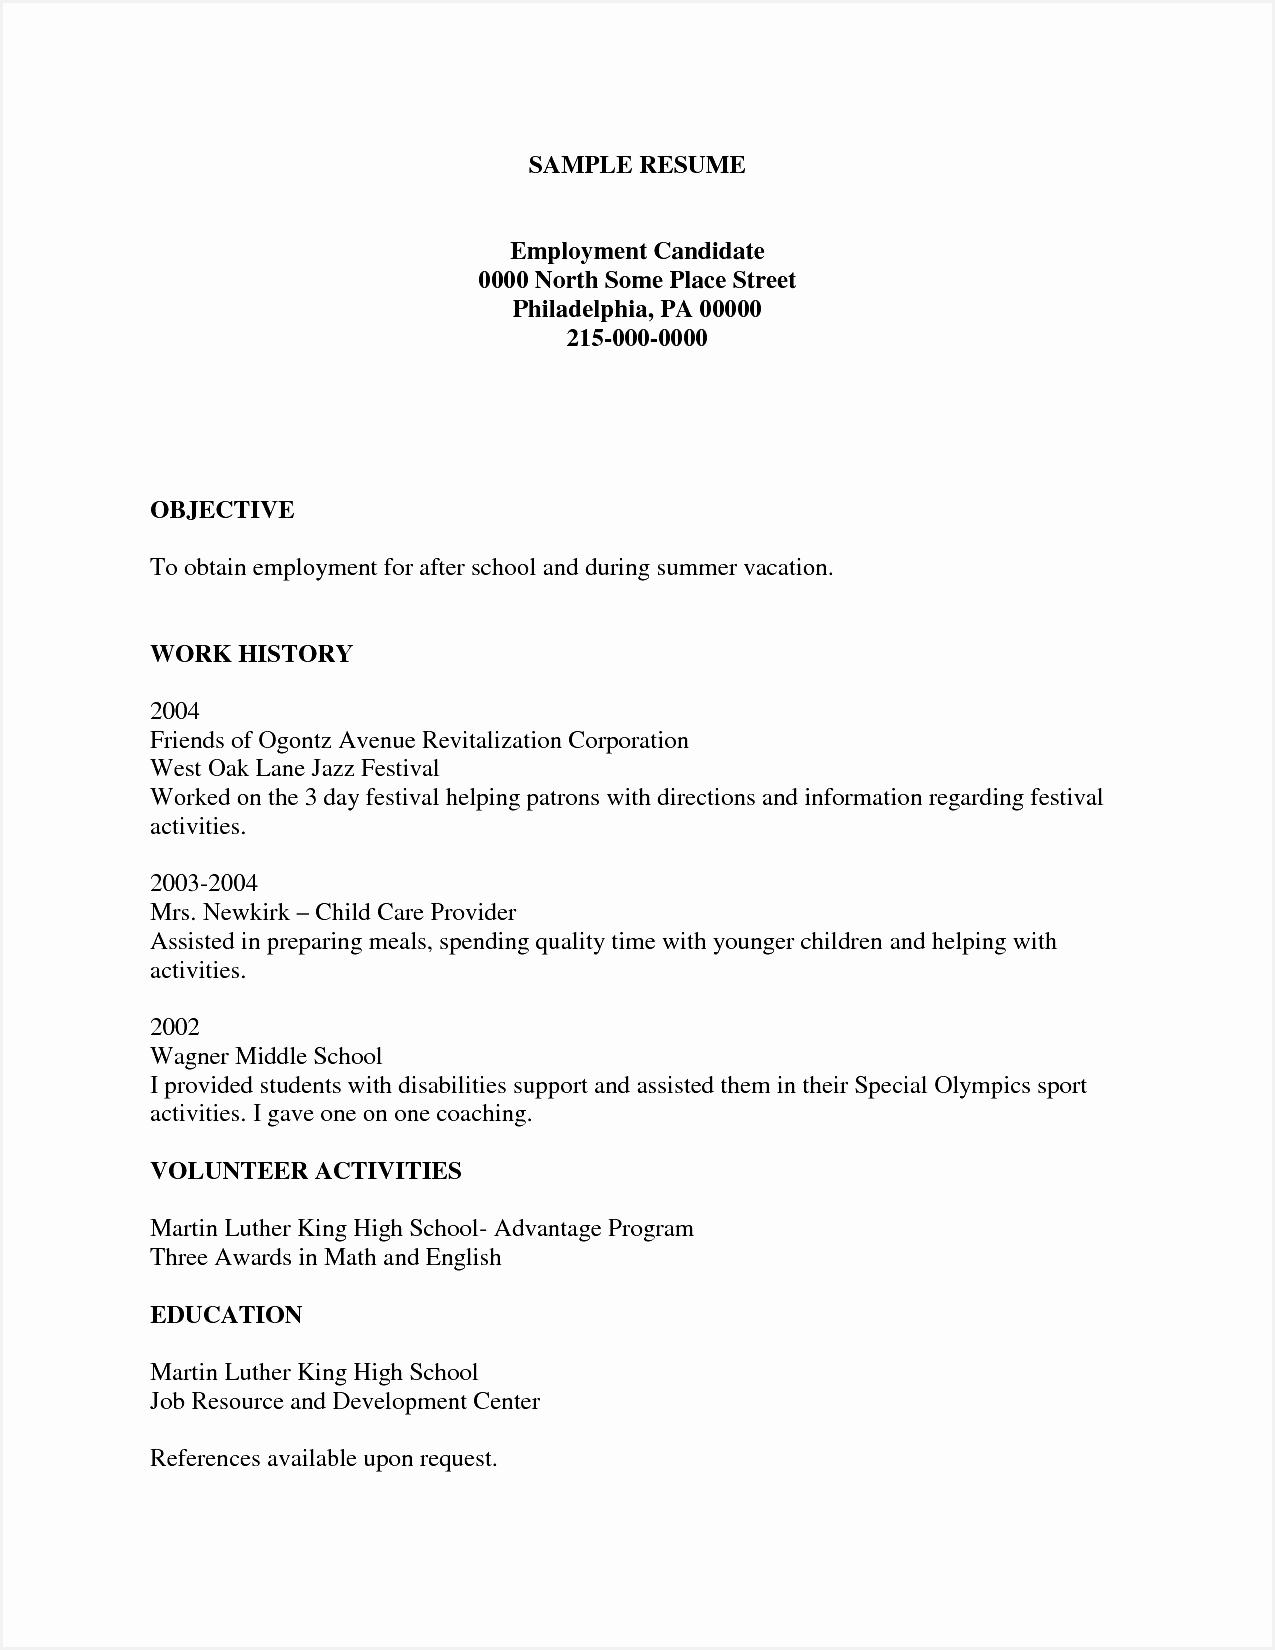 free australian resume template curriculum vitae doc cv word s templatesor microsoft beautiful templates16501275